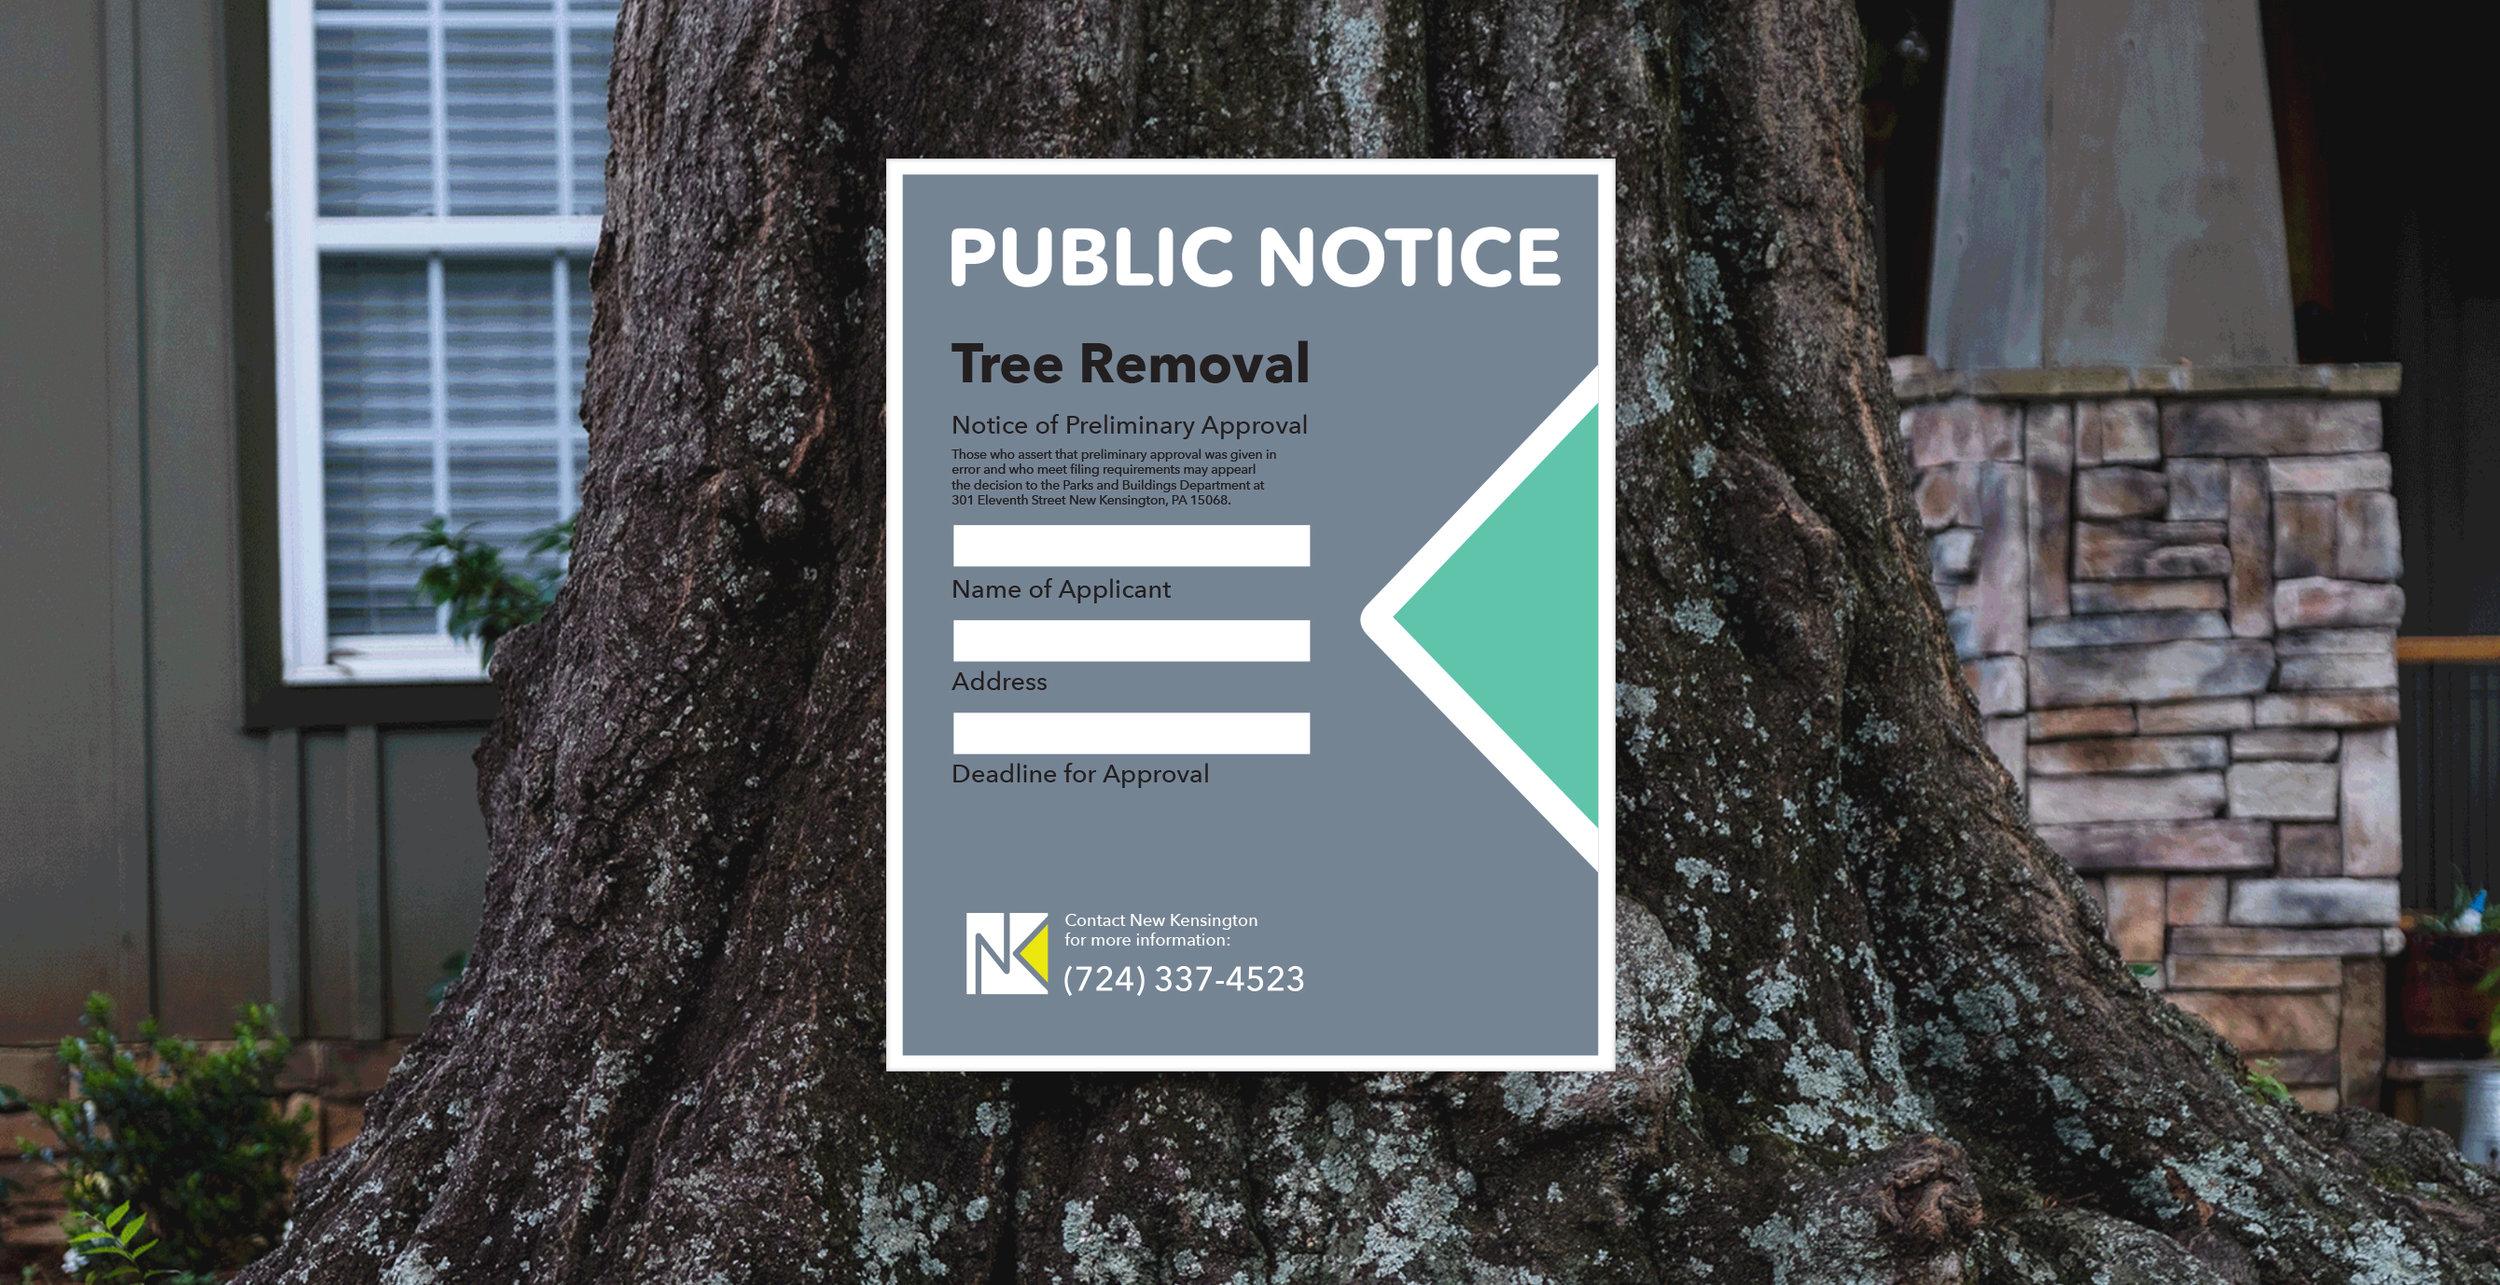 NewKen_NoticeSign_Concept2_Green.jpg